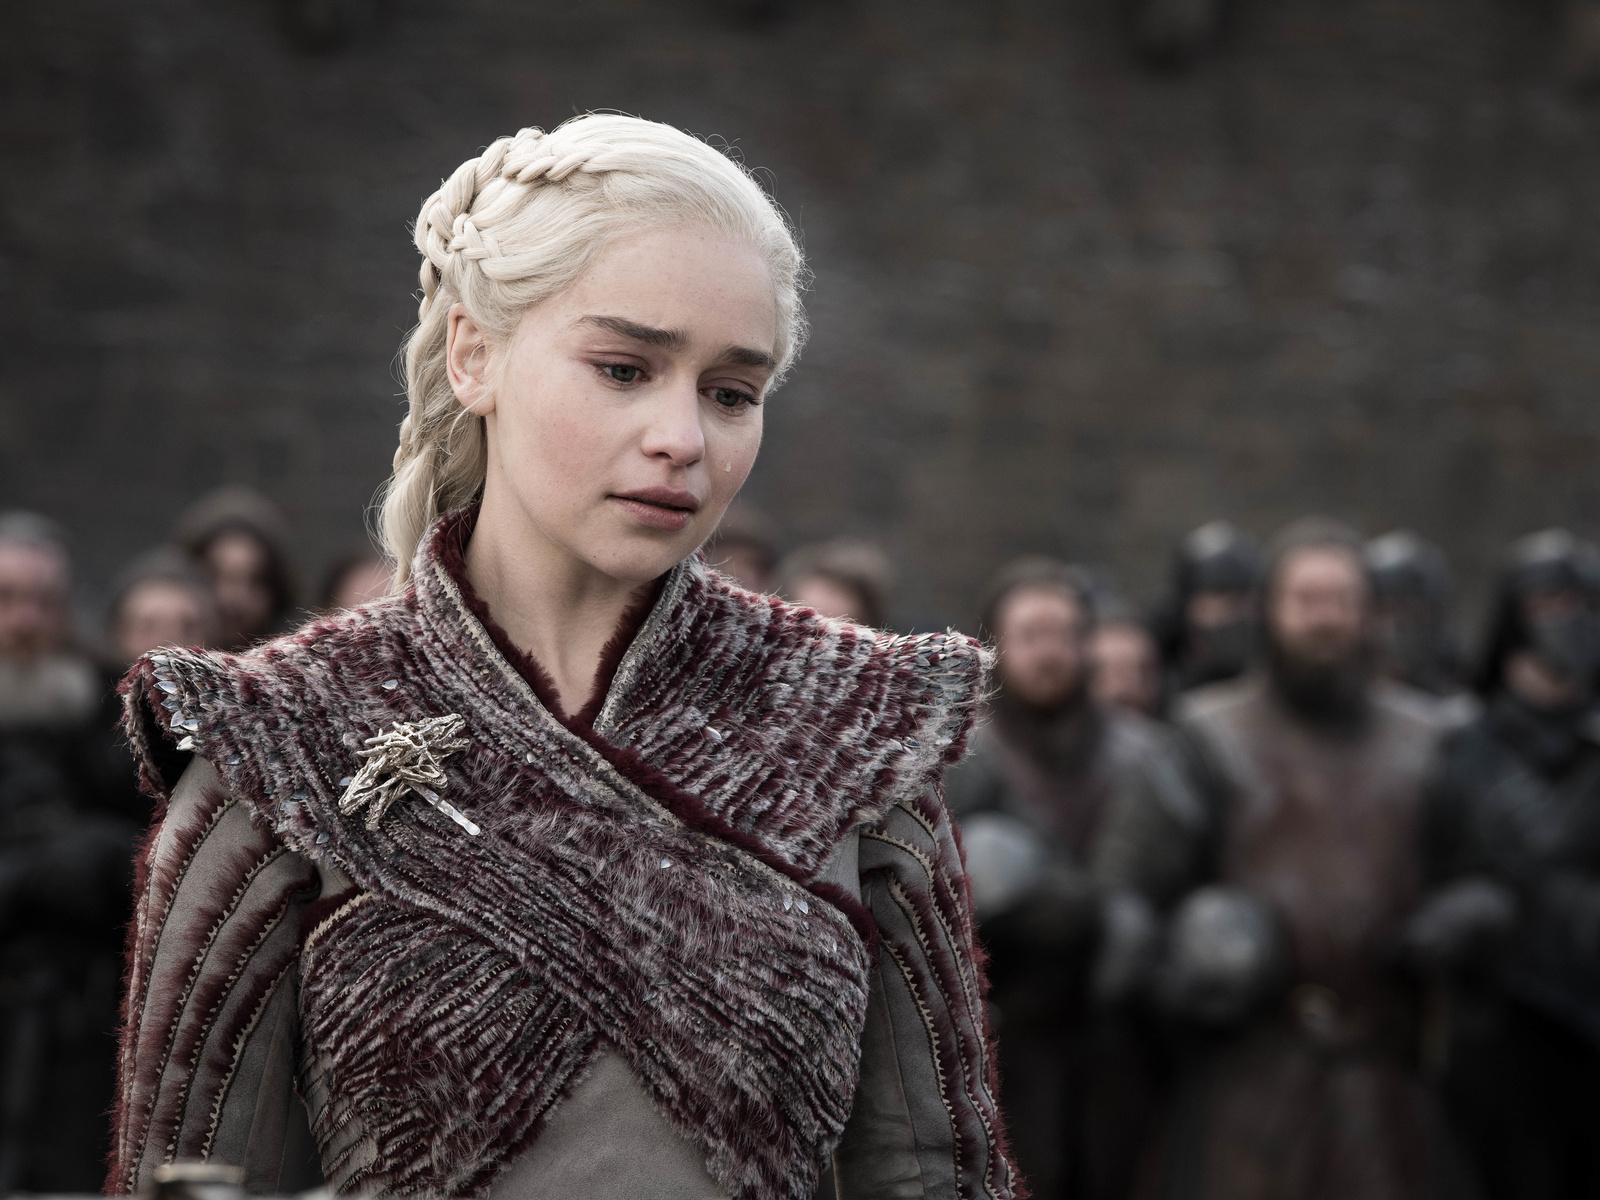 1600x1200 Daenerys Targaryen Season 8 1600x1200 Resolution